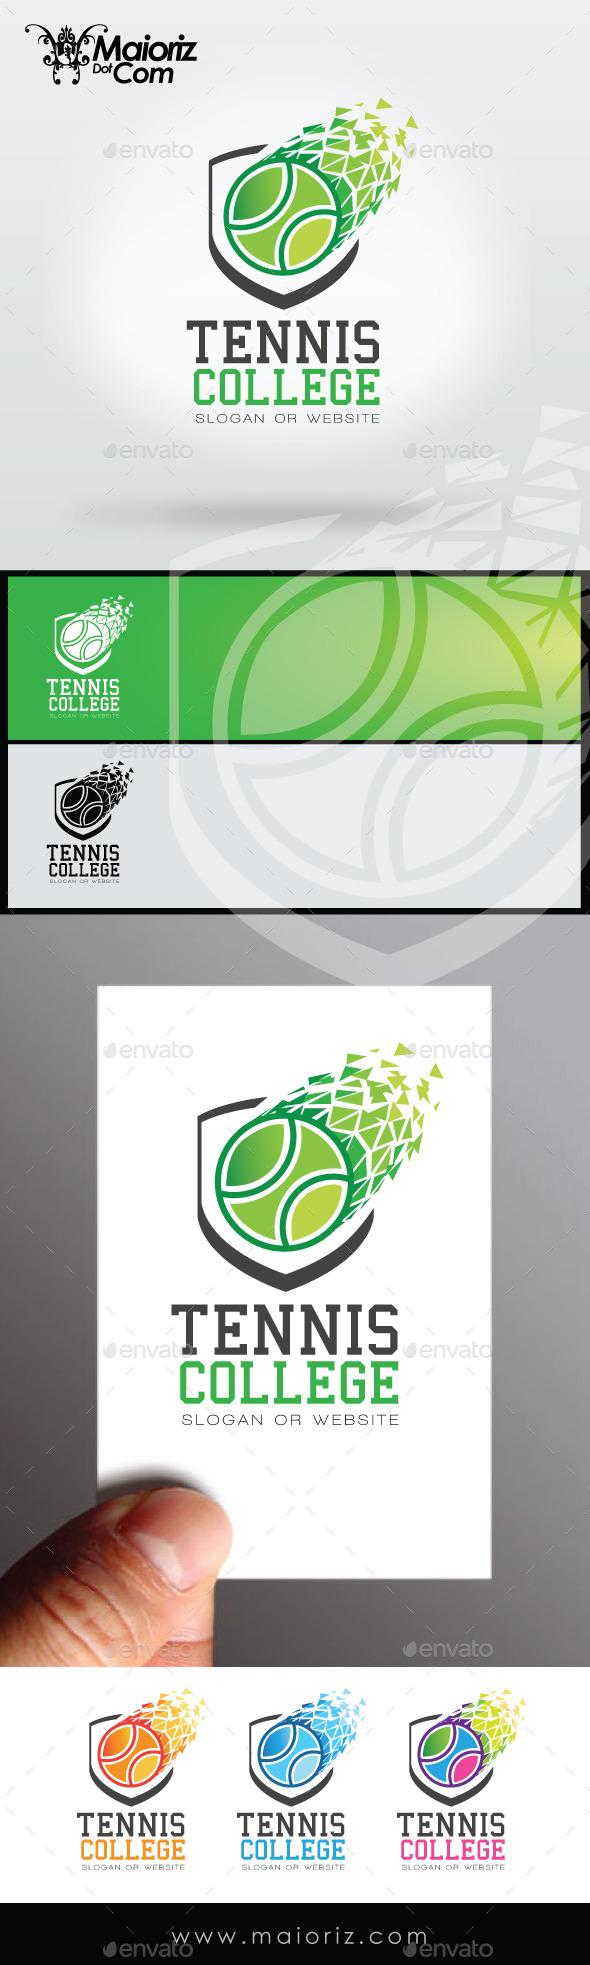 GraphicRiver Tennis College Logo 8938579